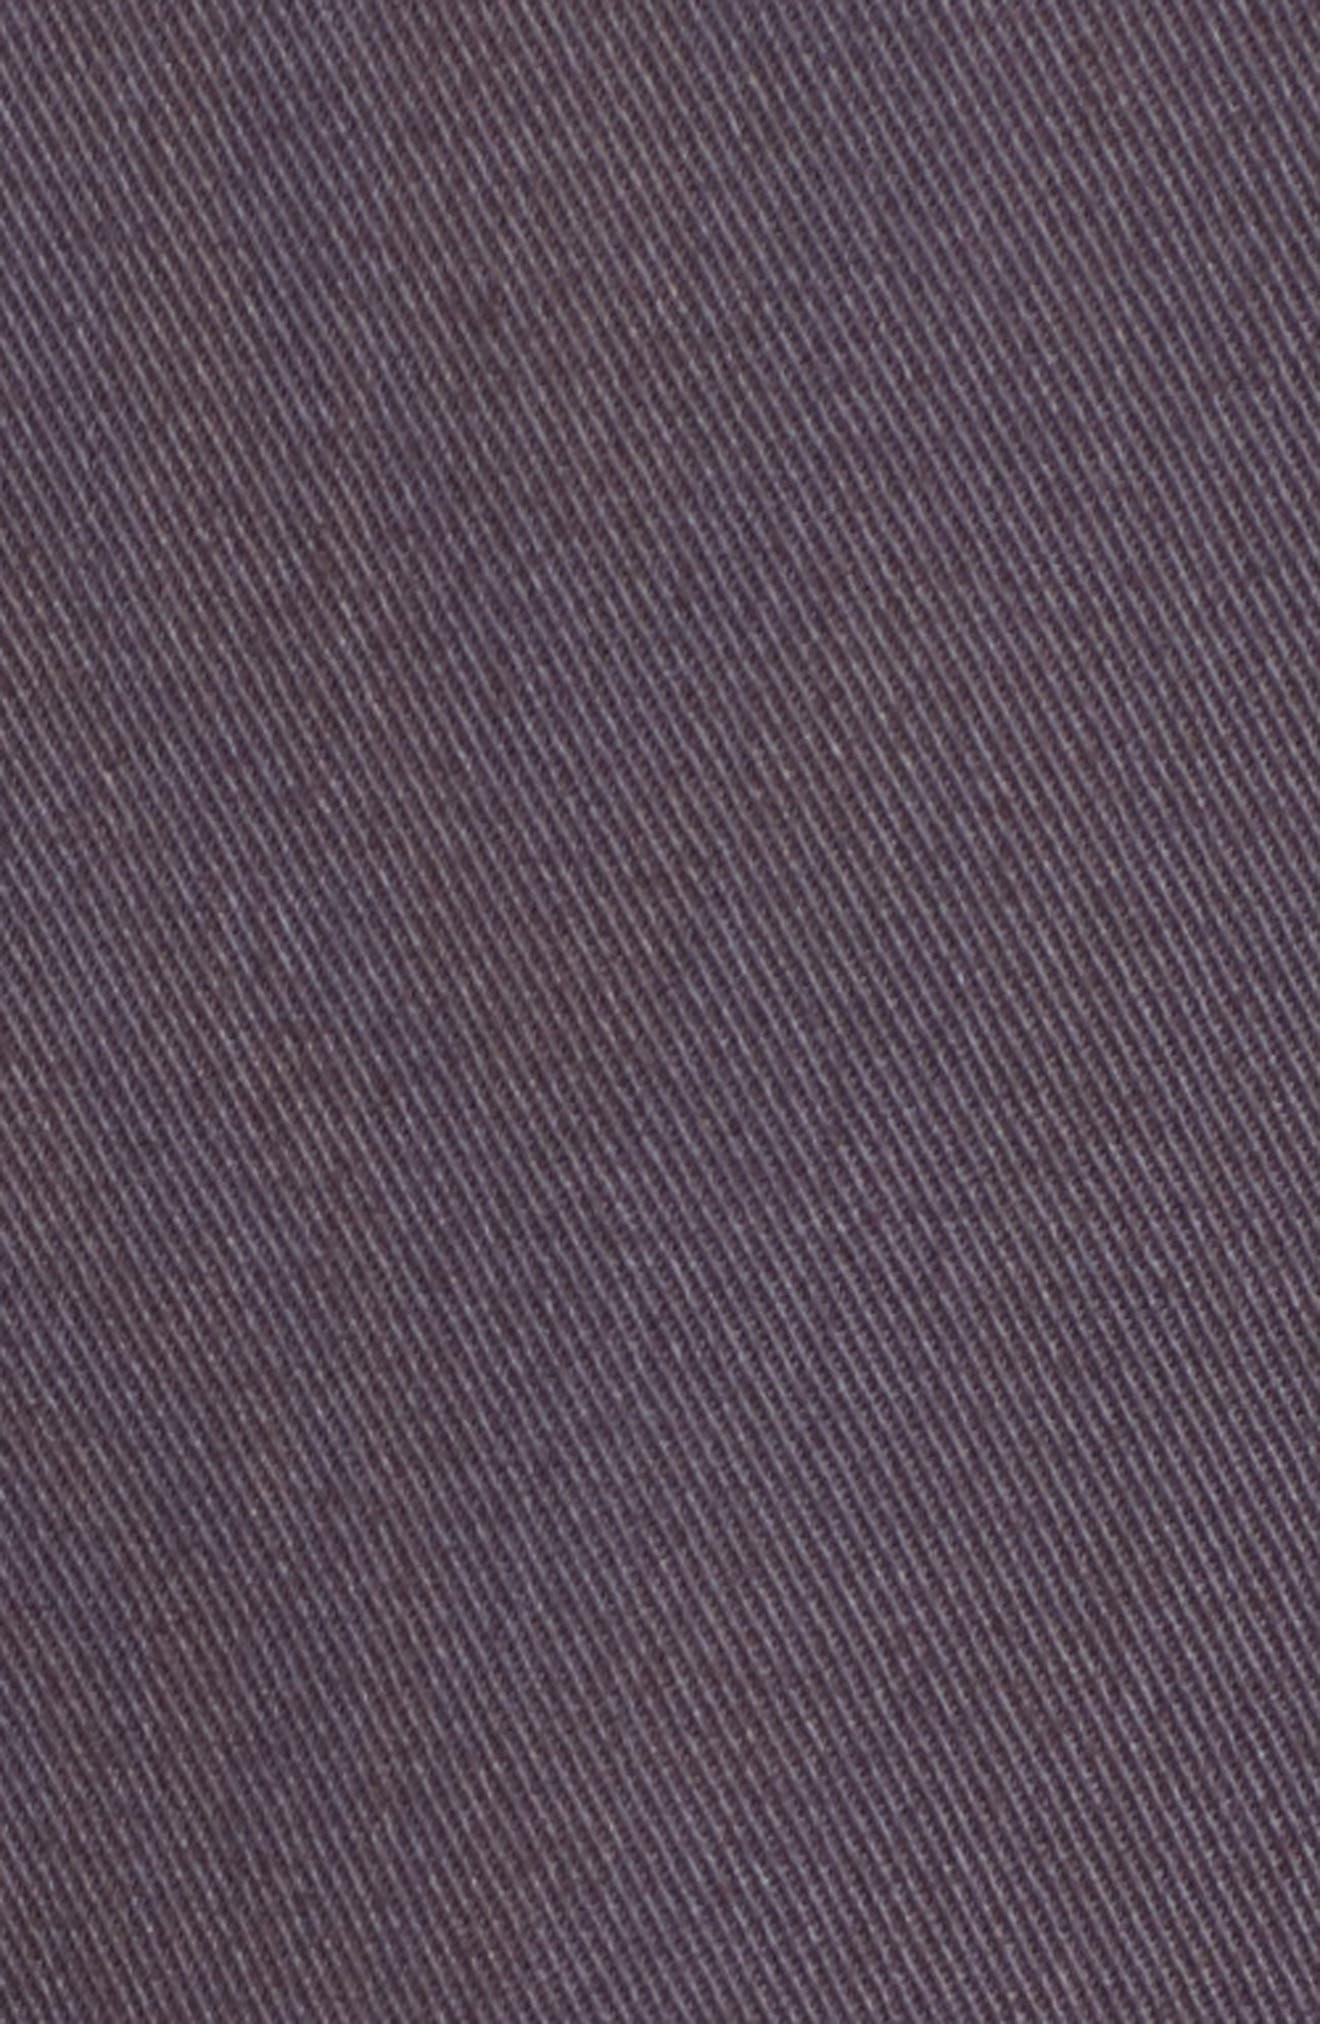 Cliford Trim Fit Stretch Cotton Blazer,                             Alternate thumbnail 5, color,                             Light Grey